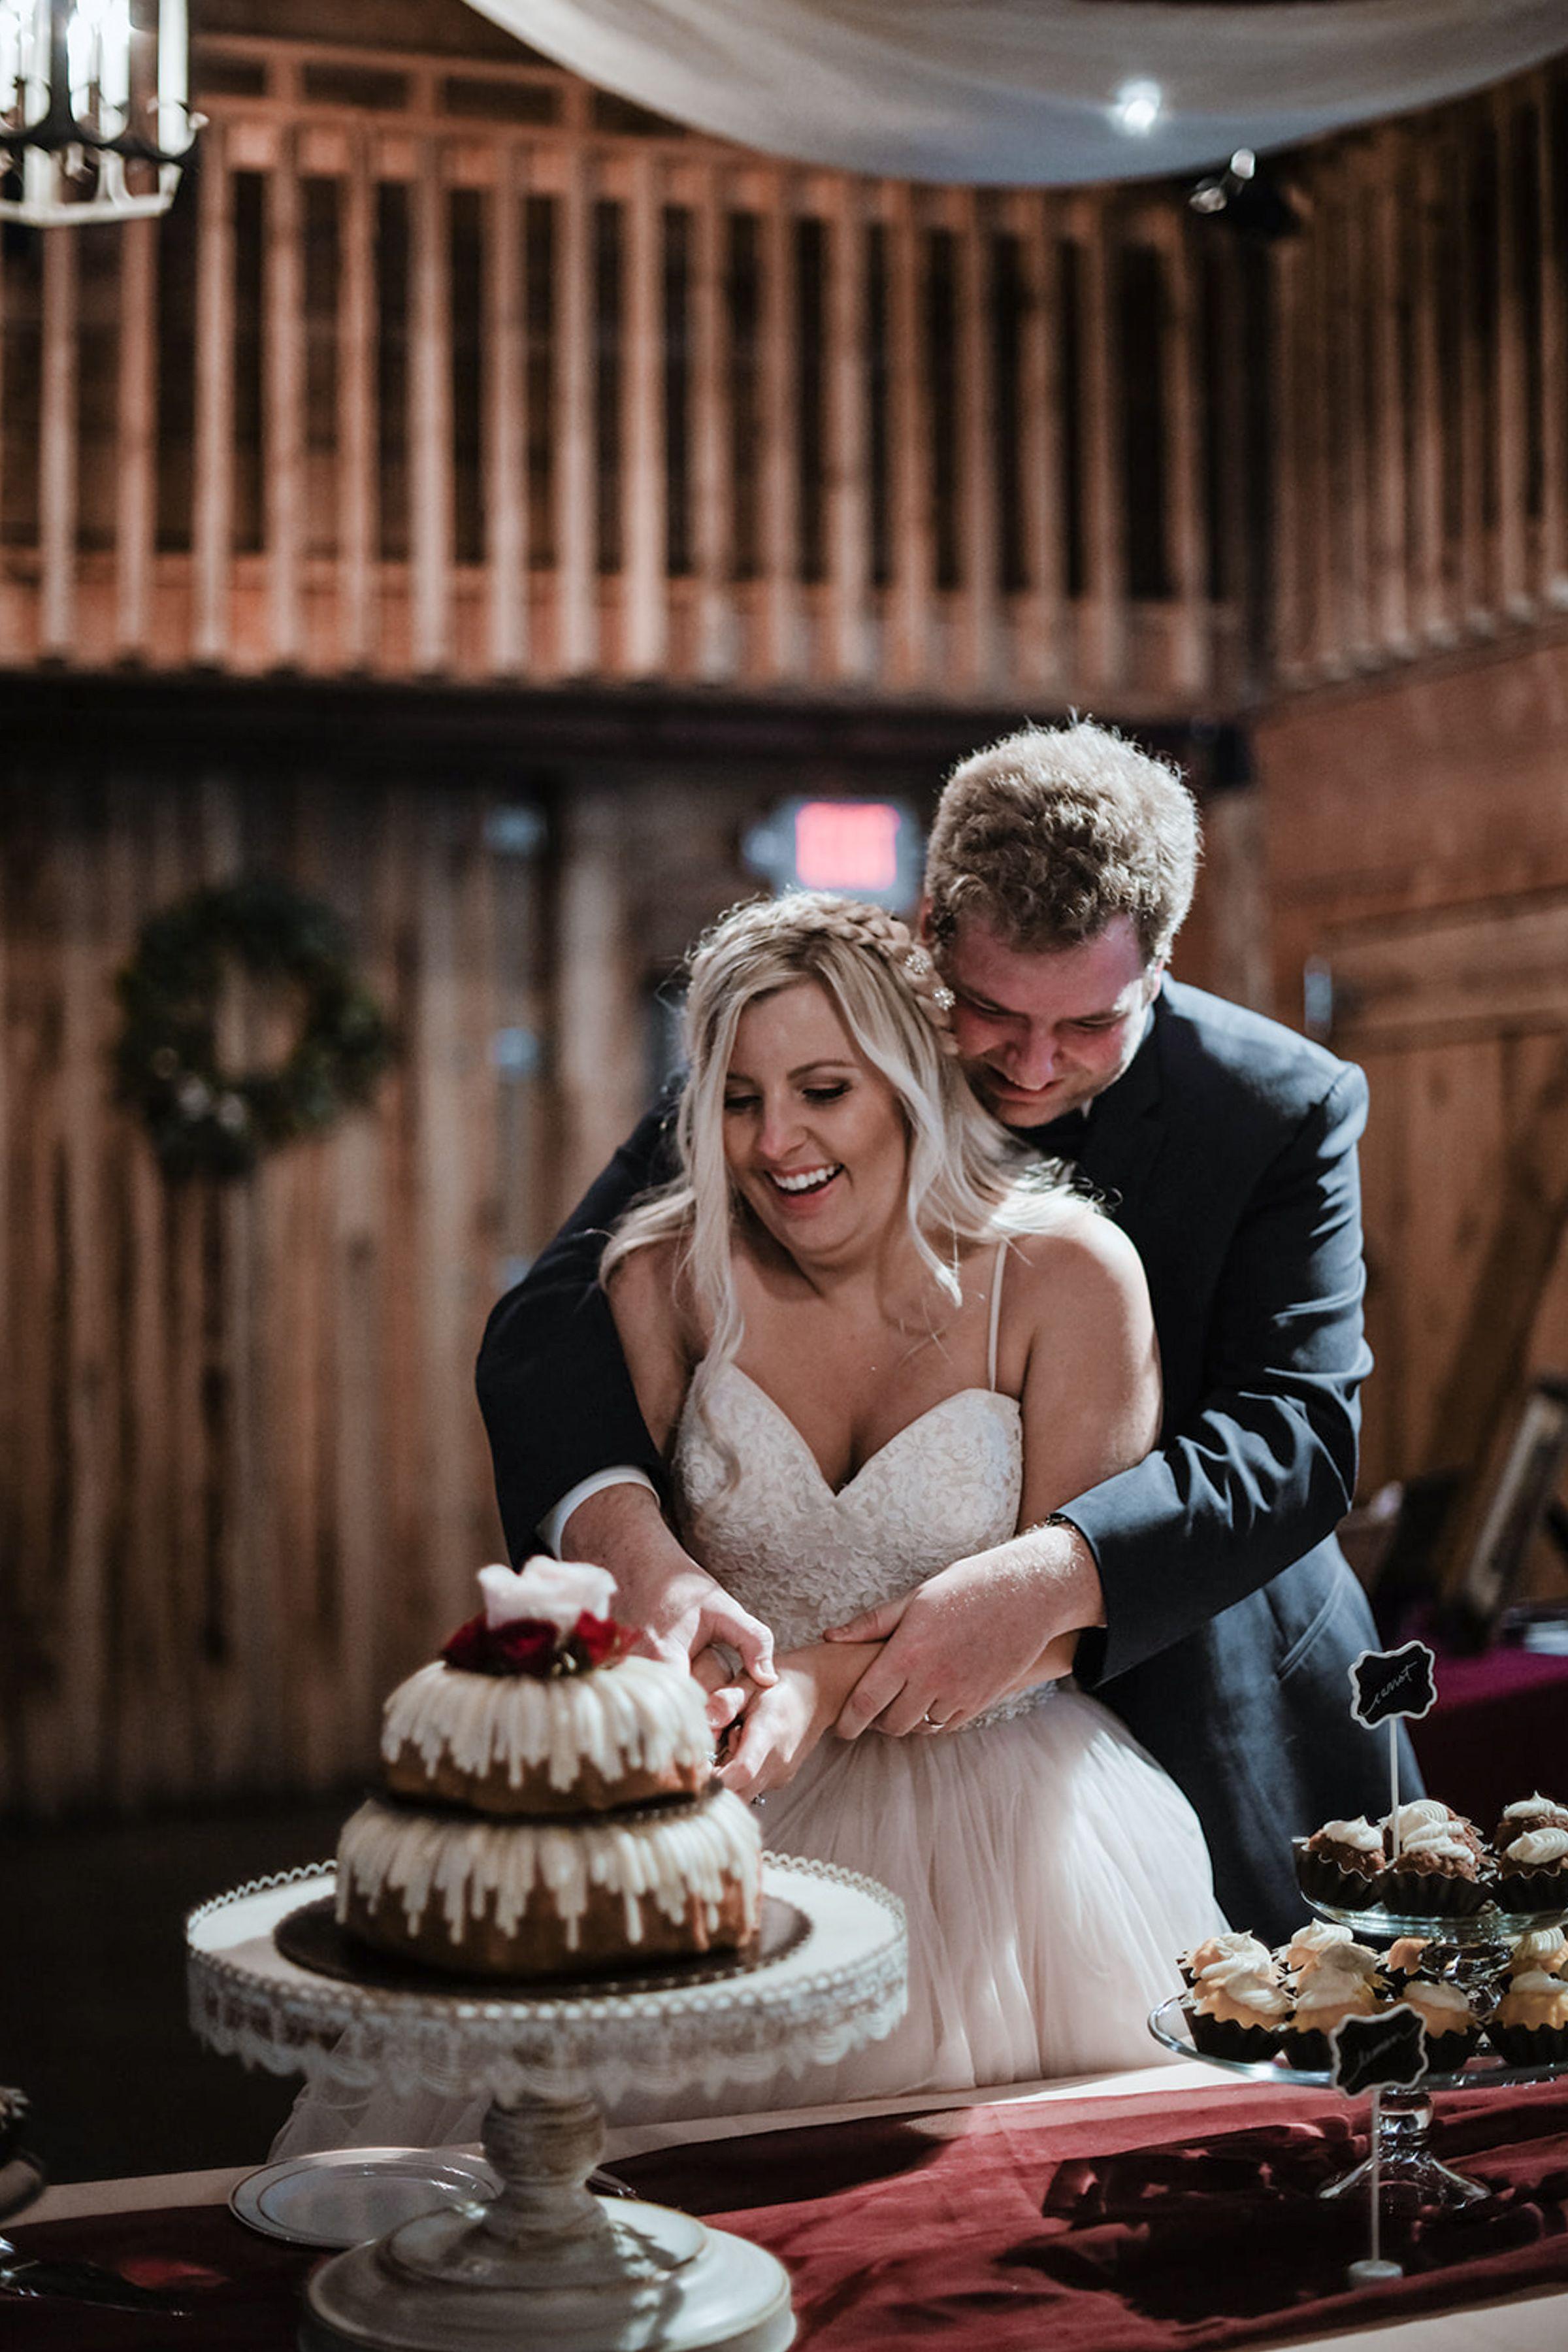 Northwest Arkansas Wedding Venue In 2020 Arkansas Wedding Venues Northwest Arkansas Weddings Arkansas Wedding